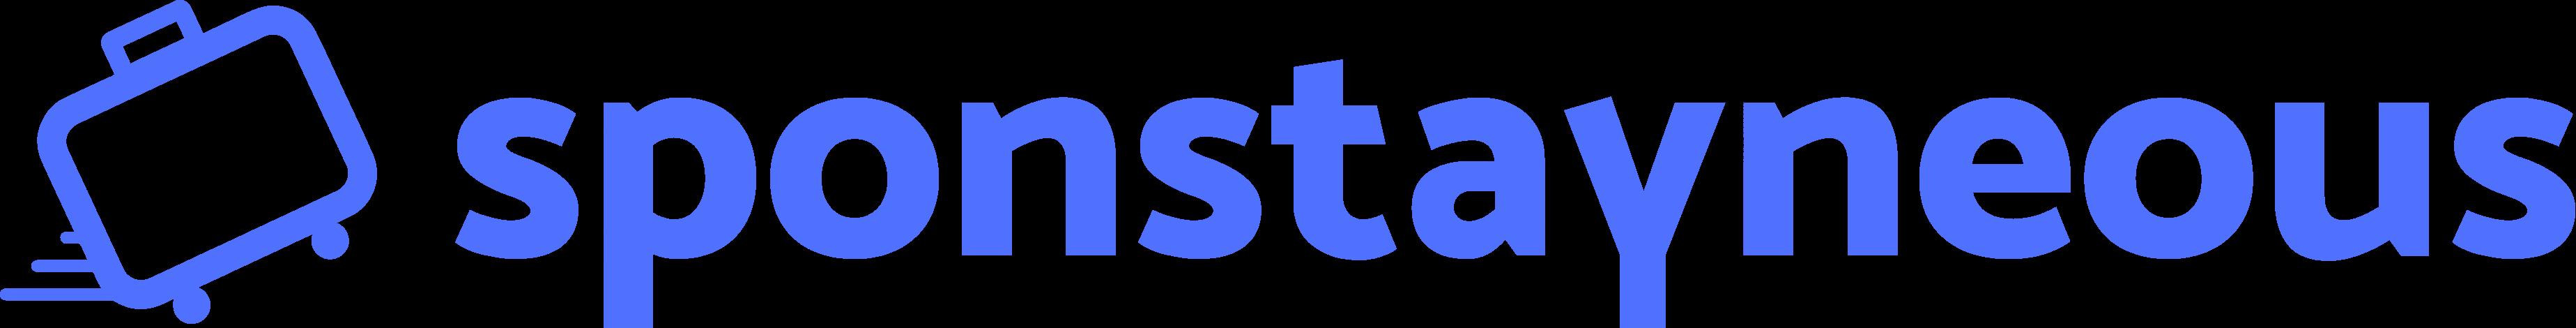 Sponstayneous-logo-blue